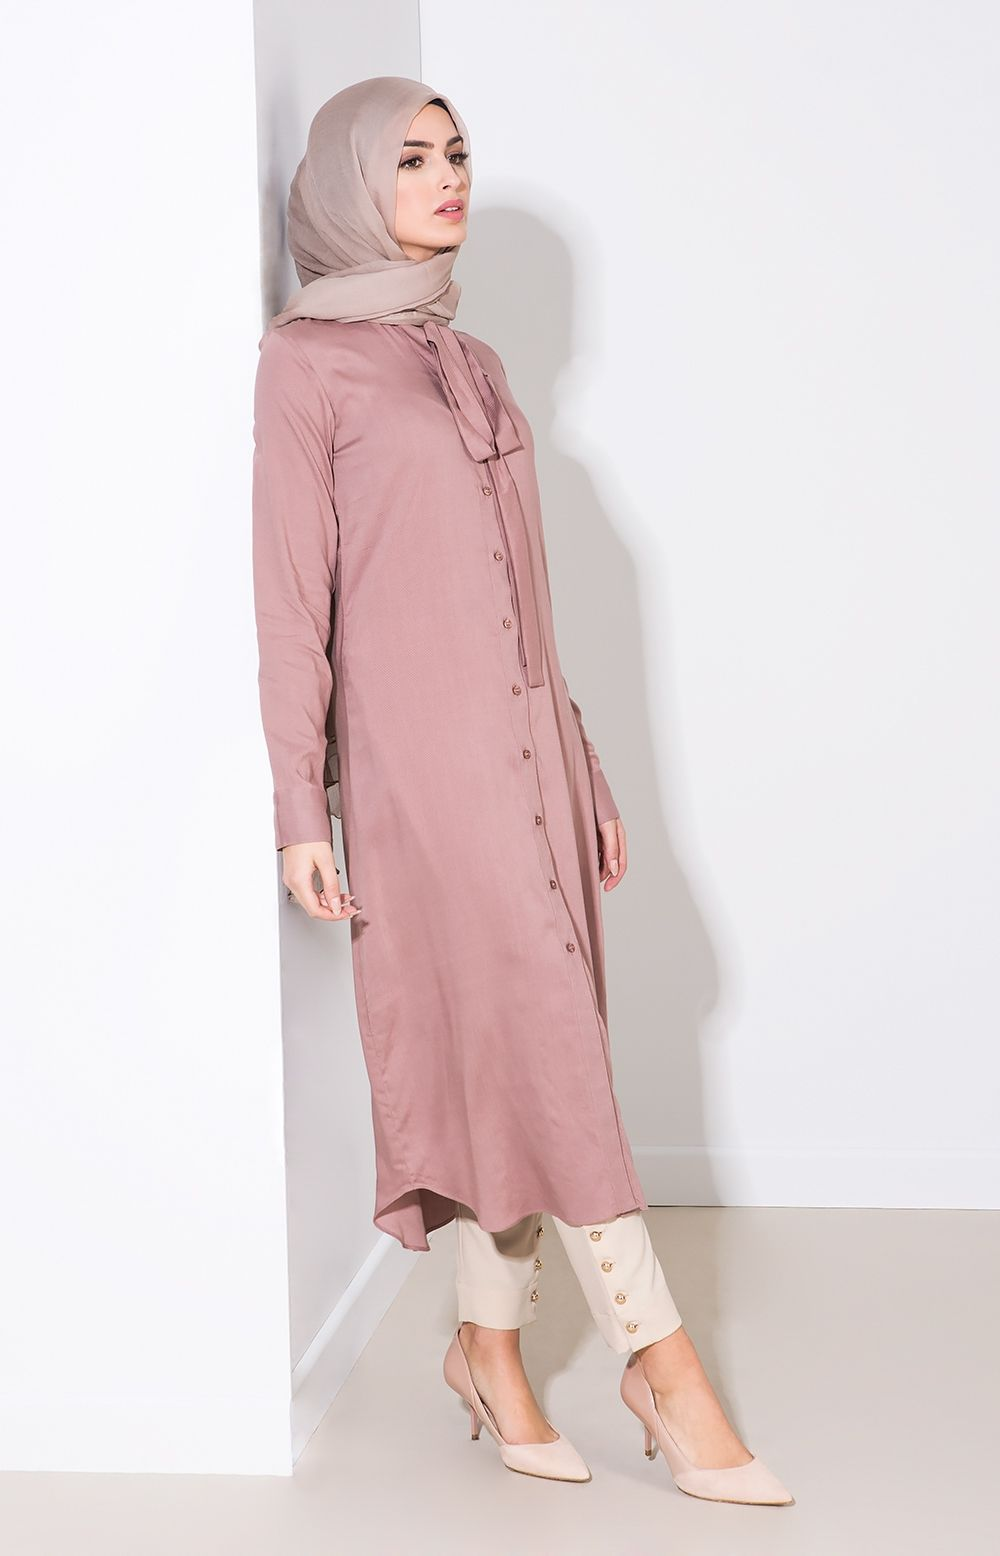 Aab uk slim tie midi dusty pink standard view clothes